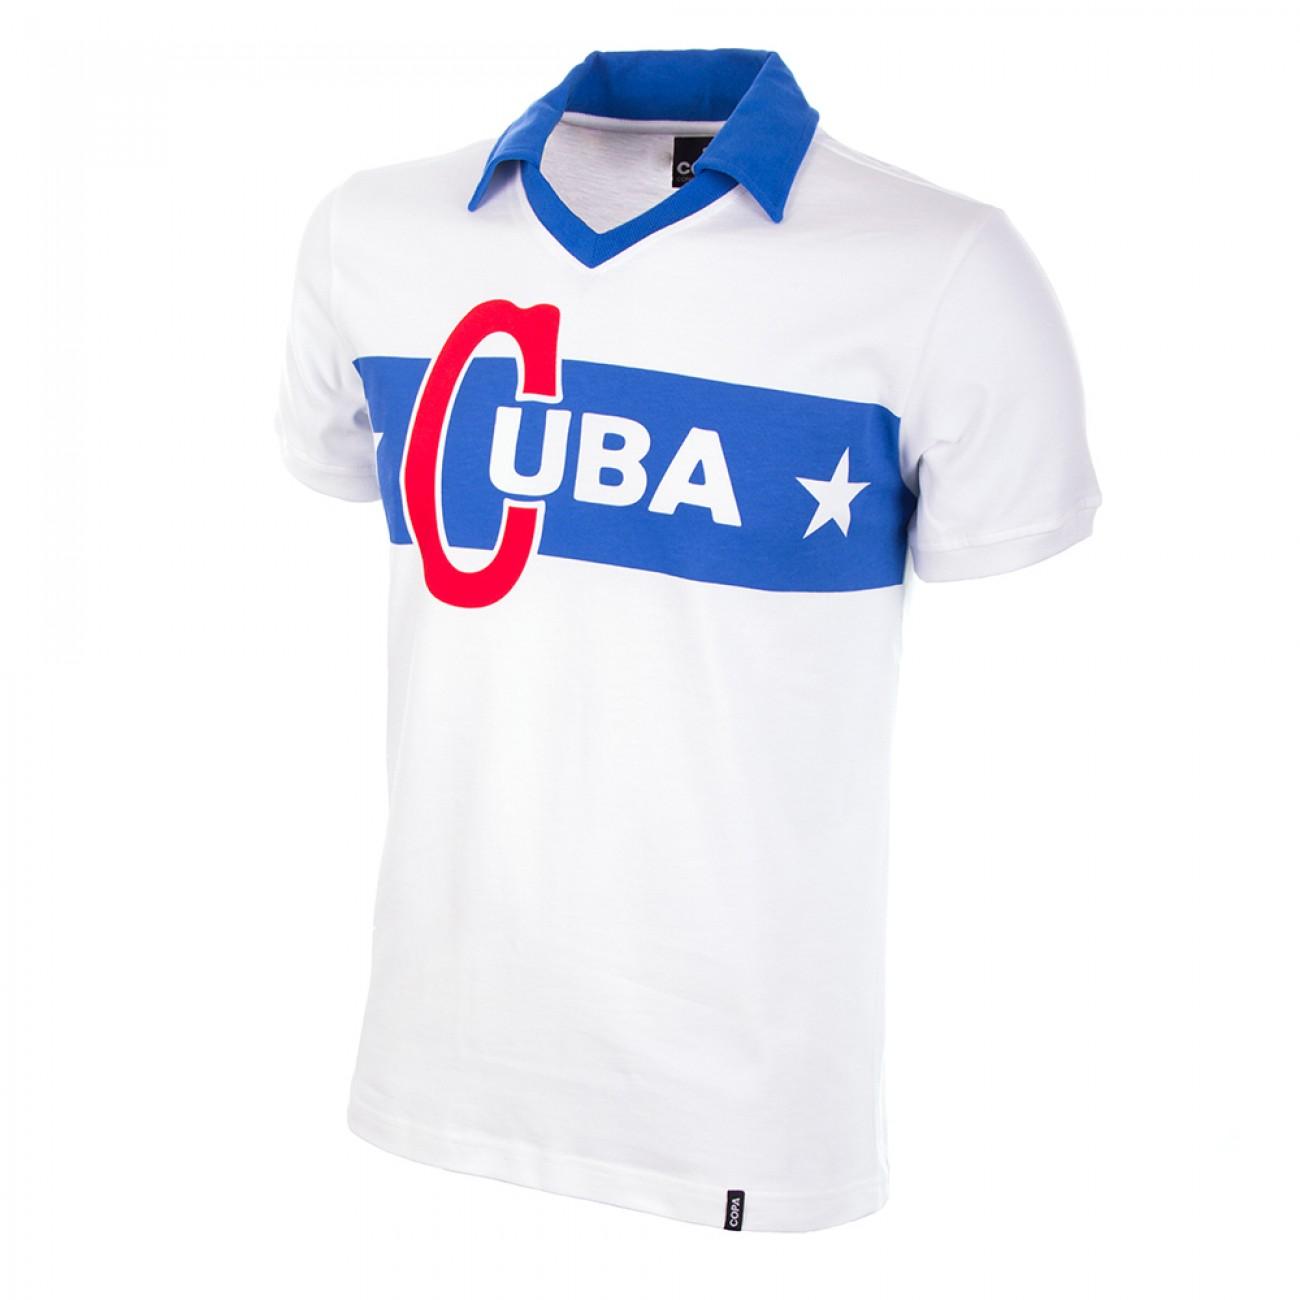 http://www.retrofootball.es/ropa-de-futbol/camiseta-cuba-1962-castro.html